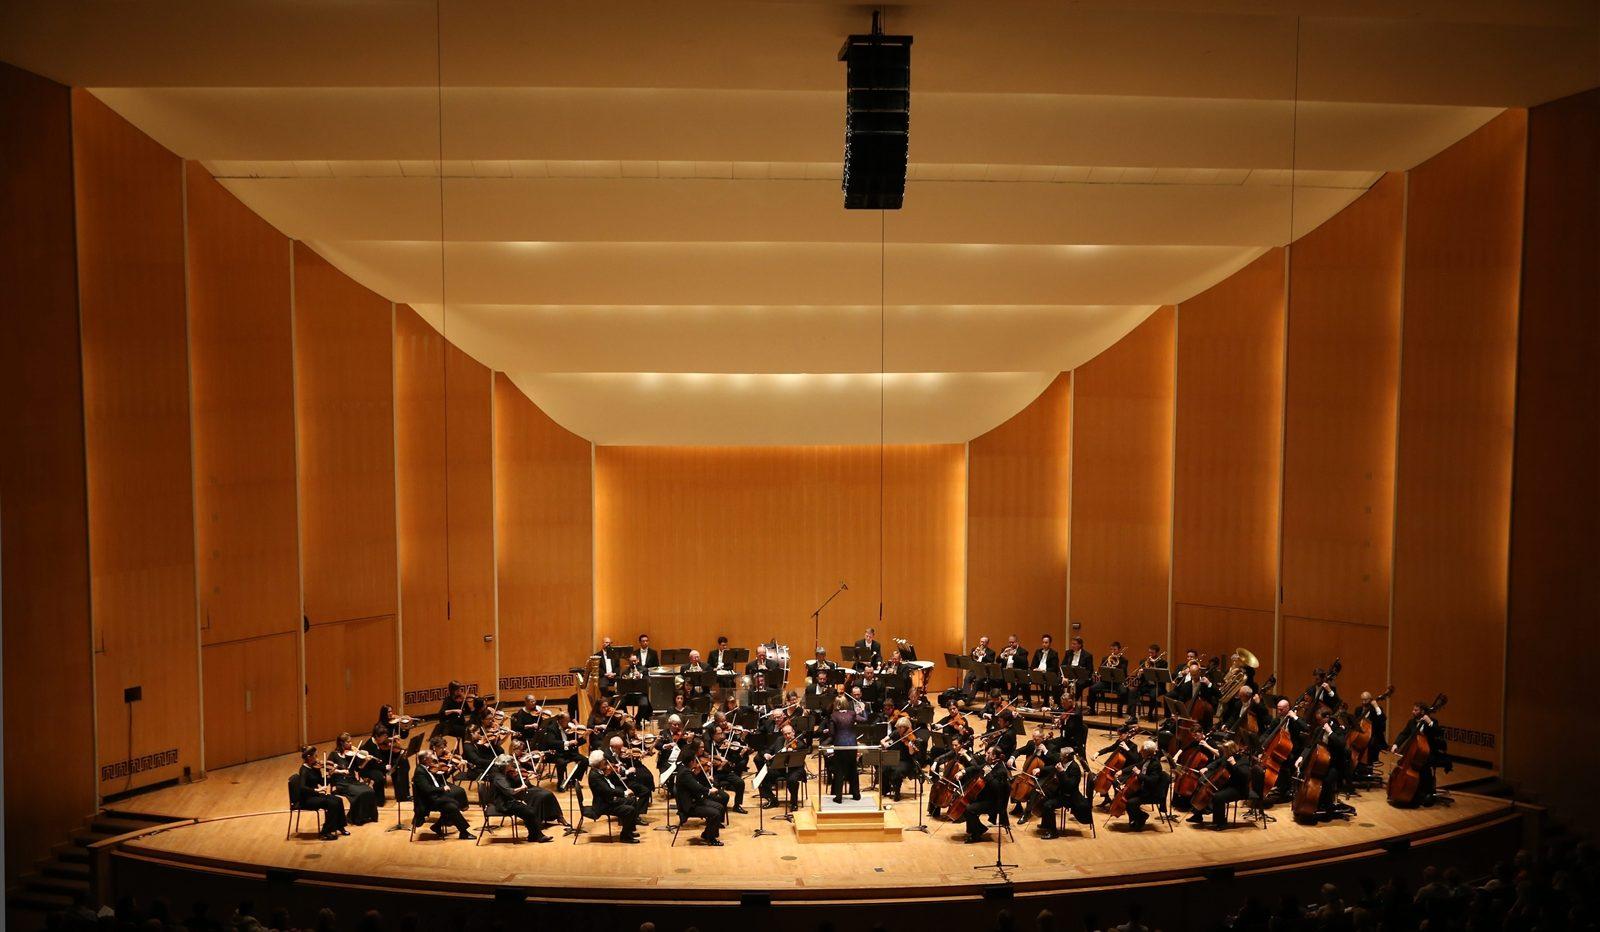 The BPO performs at Kleinhans Music Hall. (Sharon Cantillon/News file photo)